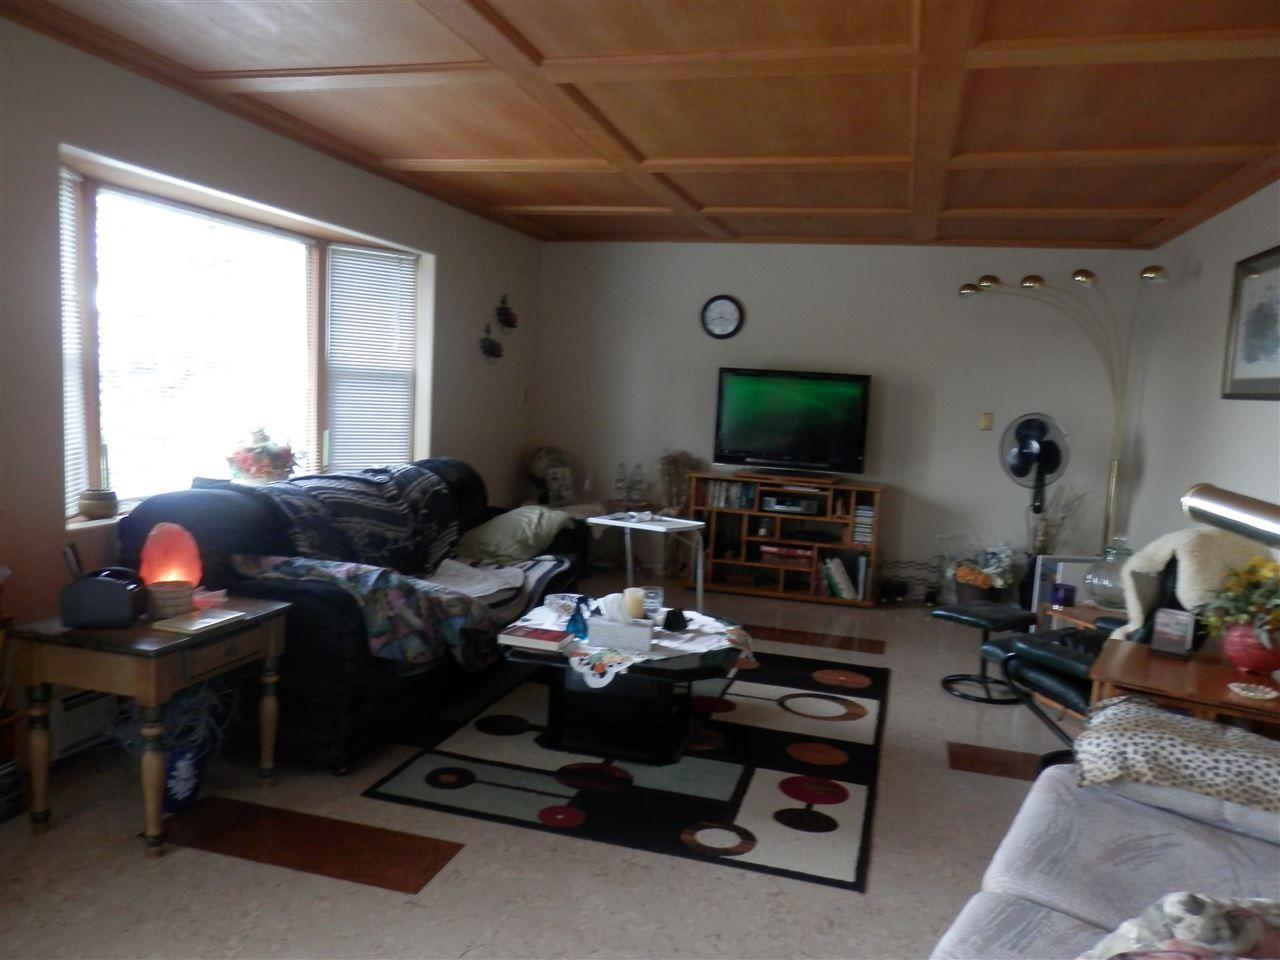 Photo 8: Photos: 935 HODGSON Road in Williams Lake: Esler/Dog Creek House for sale (Williams Lake (Zone 27))  : MLS®# R2414109